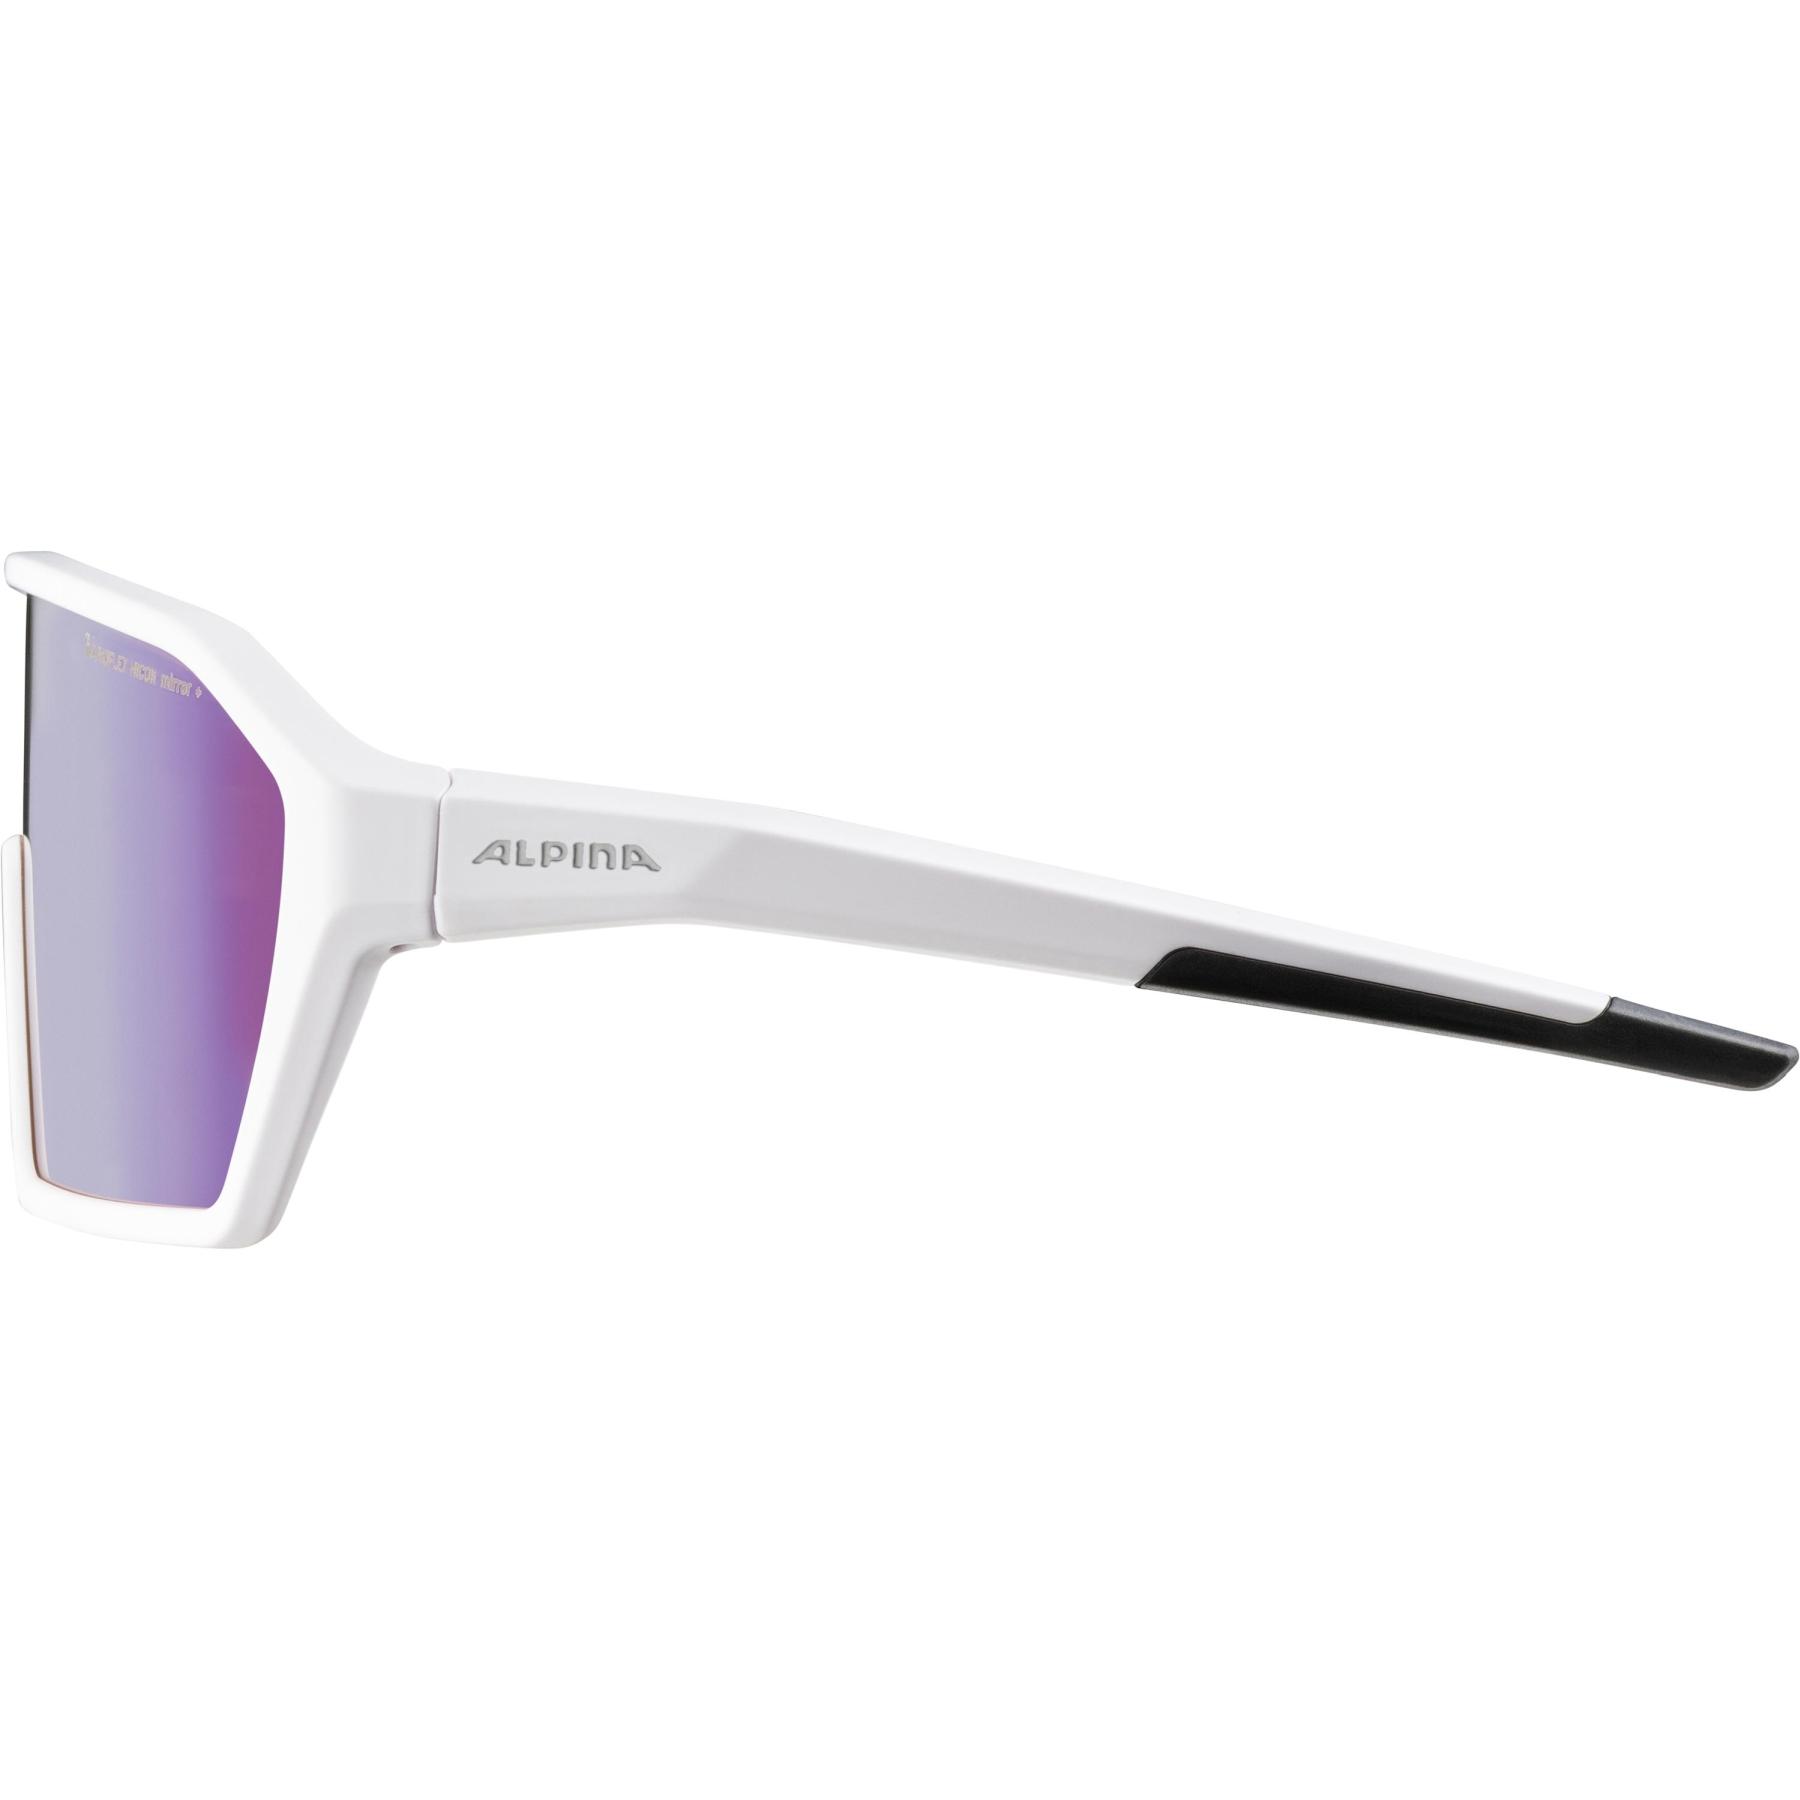 Image of Alpina Ram HVLM+ Glasses - white matt / Hicon Varioflex blue mirror